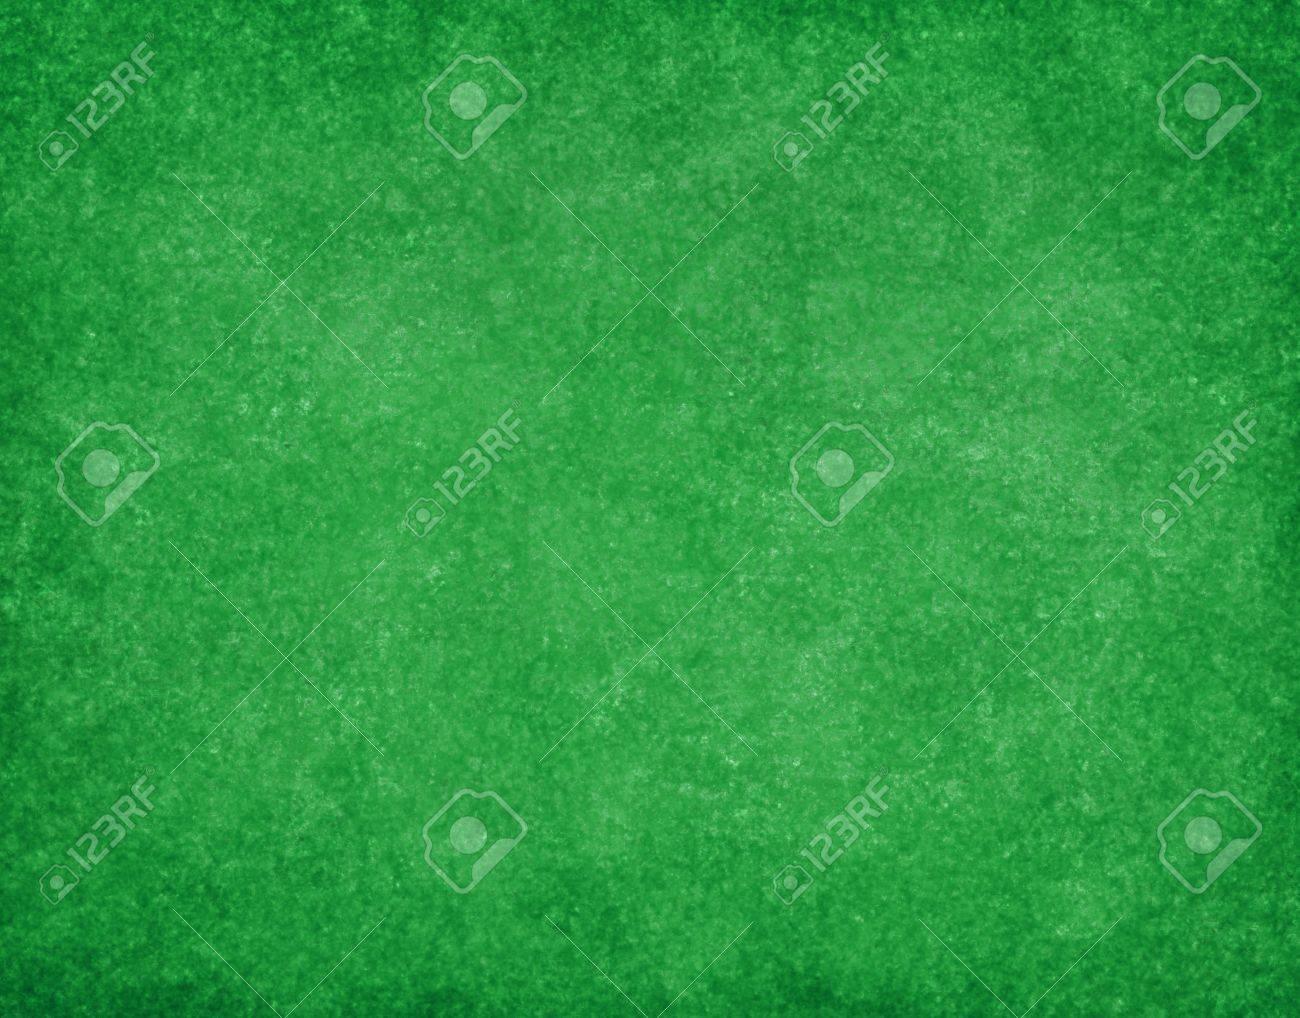 green background plain texture Stock Photo - 18916058